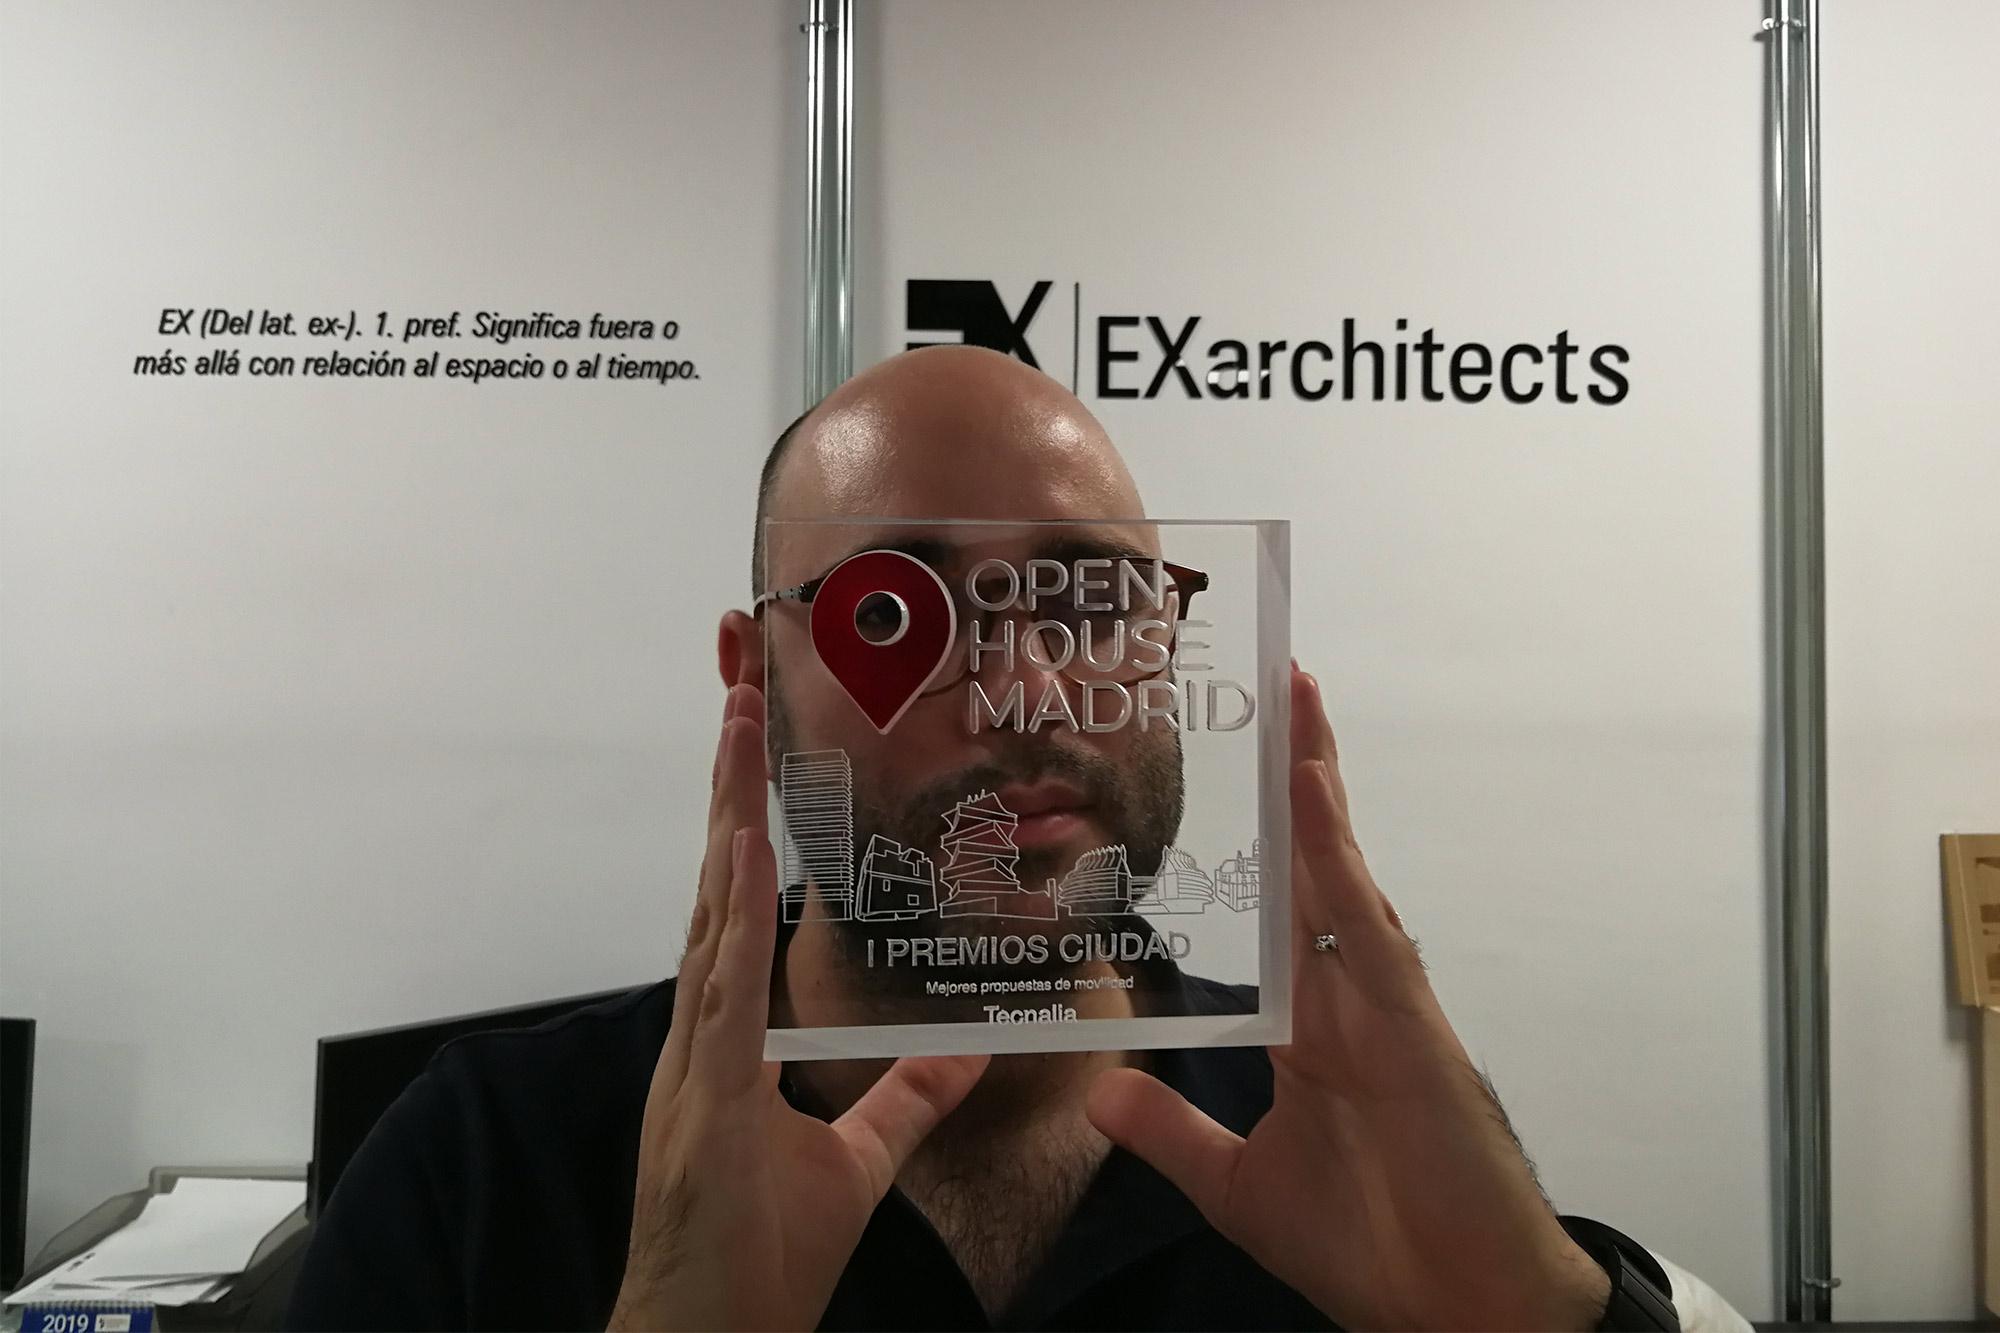 Premios-Ciudad_-Open-House-Madrid_-Diseño-_-EXarchitects_03